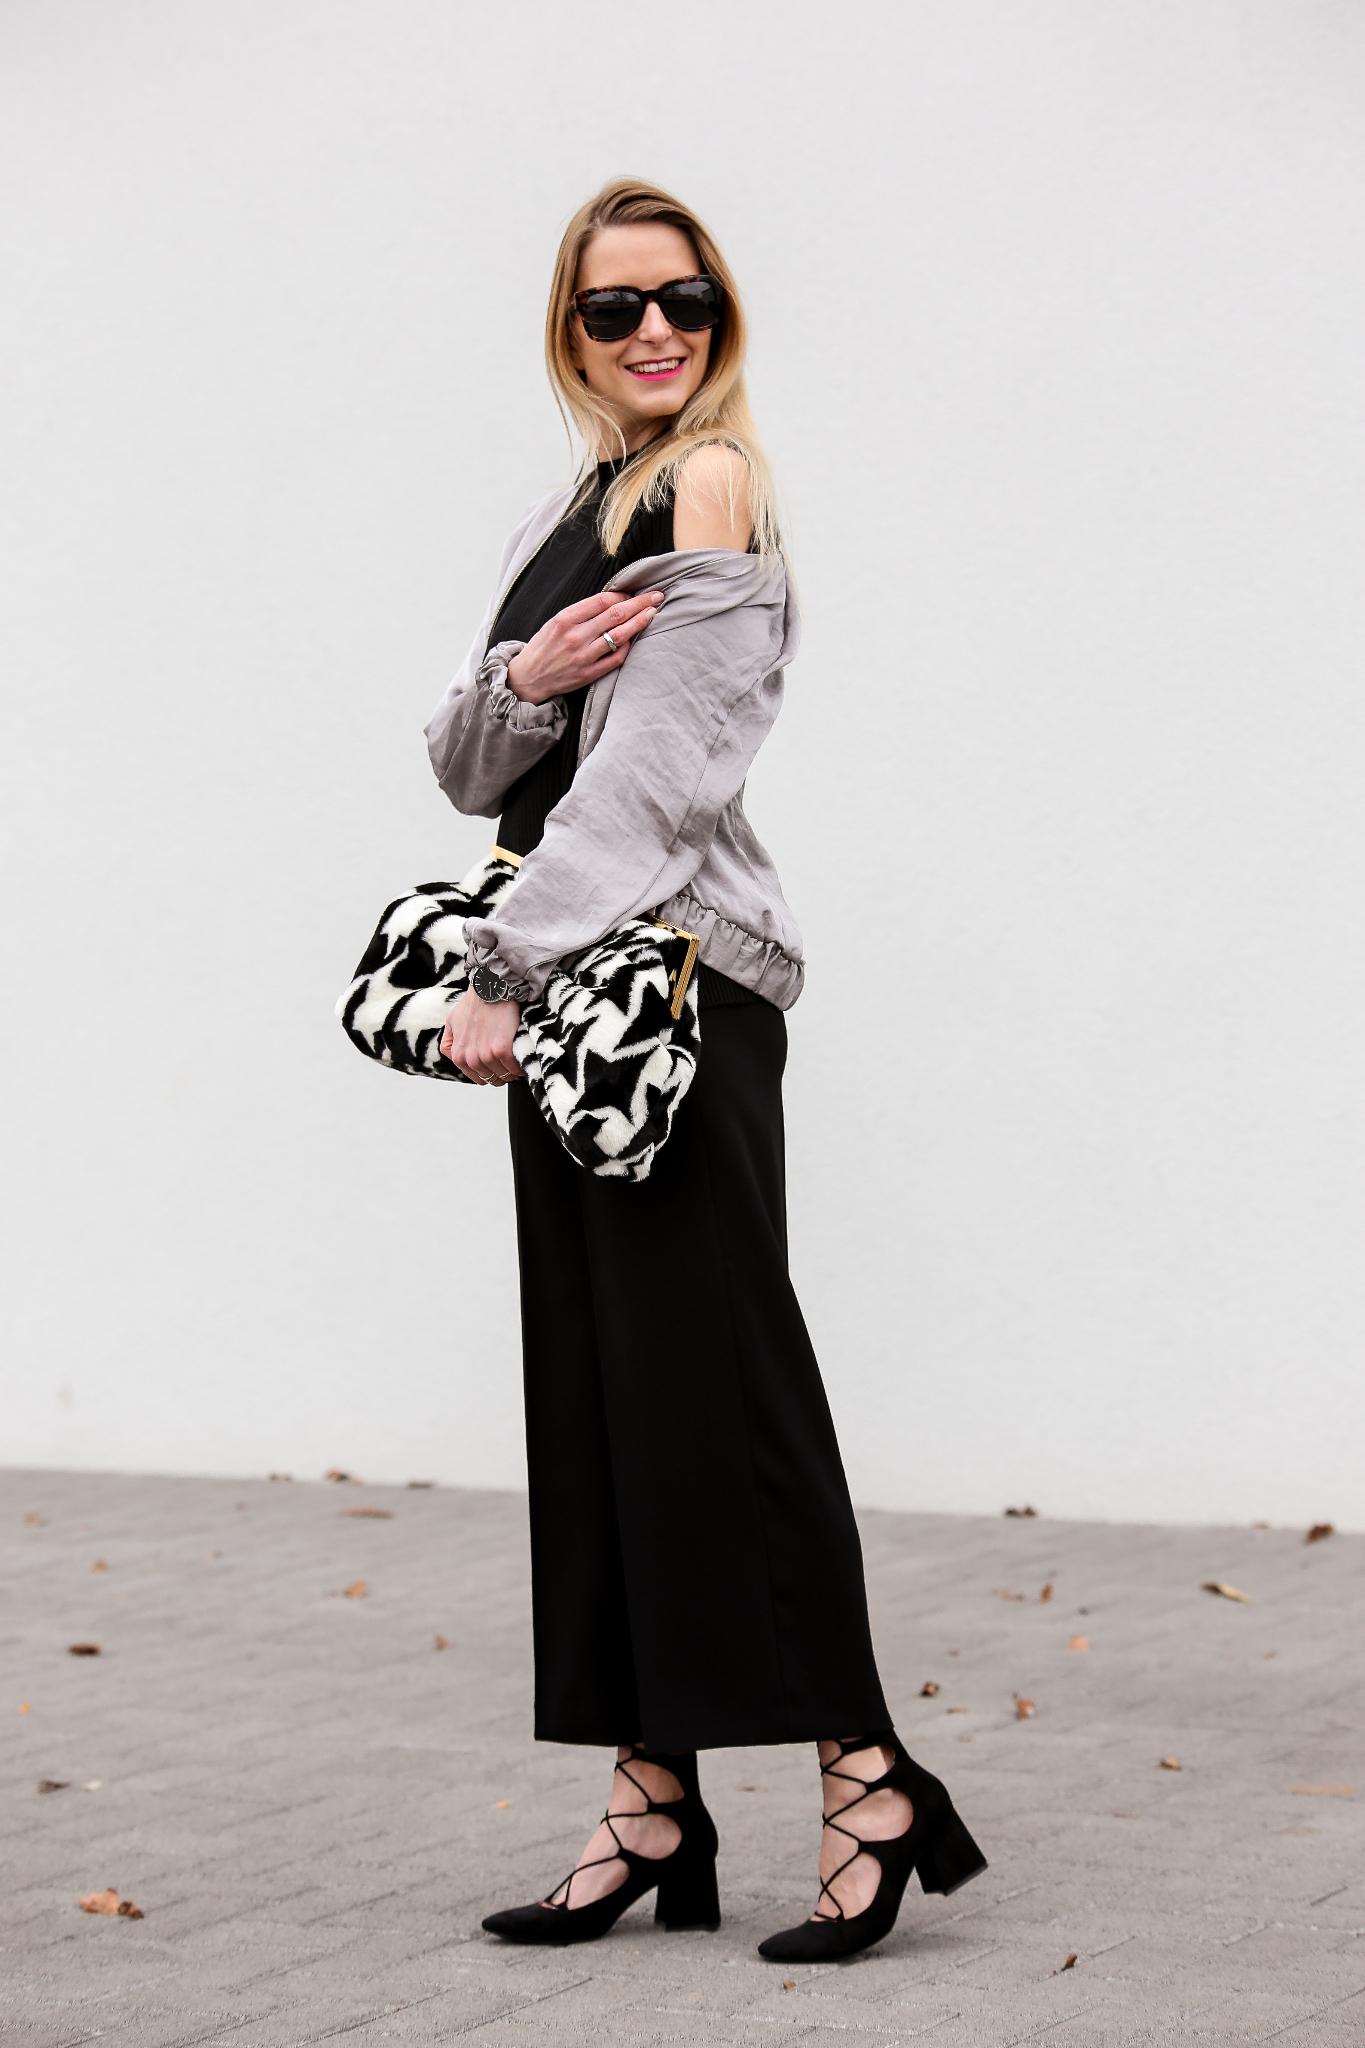 Fashion_Outfit_Satin_Bomber_Cold_Shoulder_MOD - by Monique-11